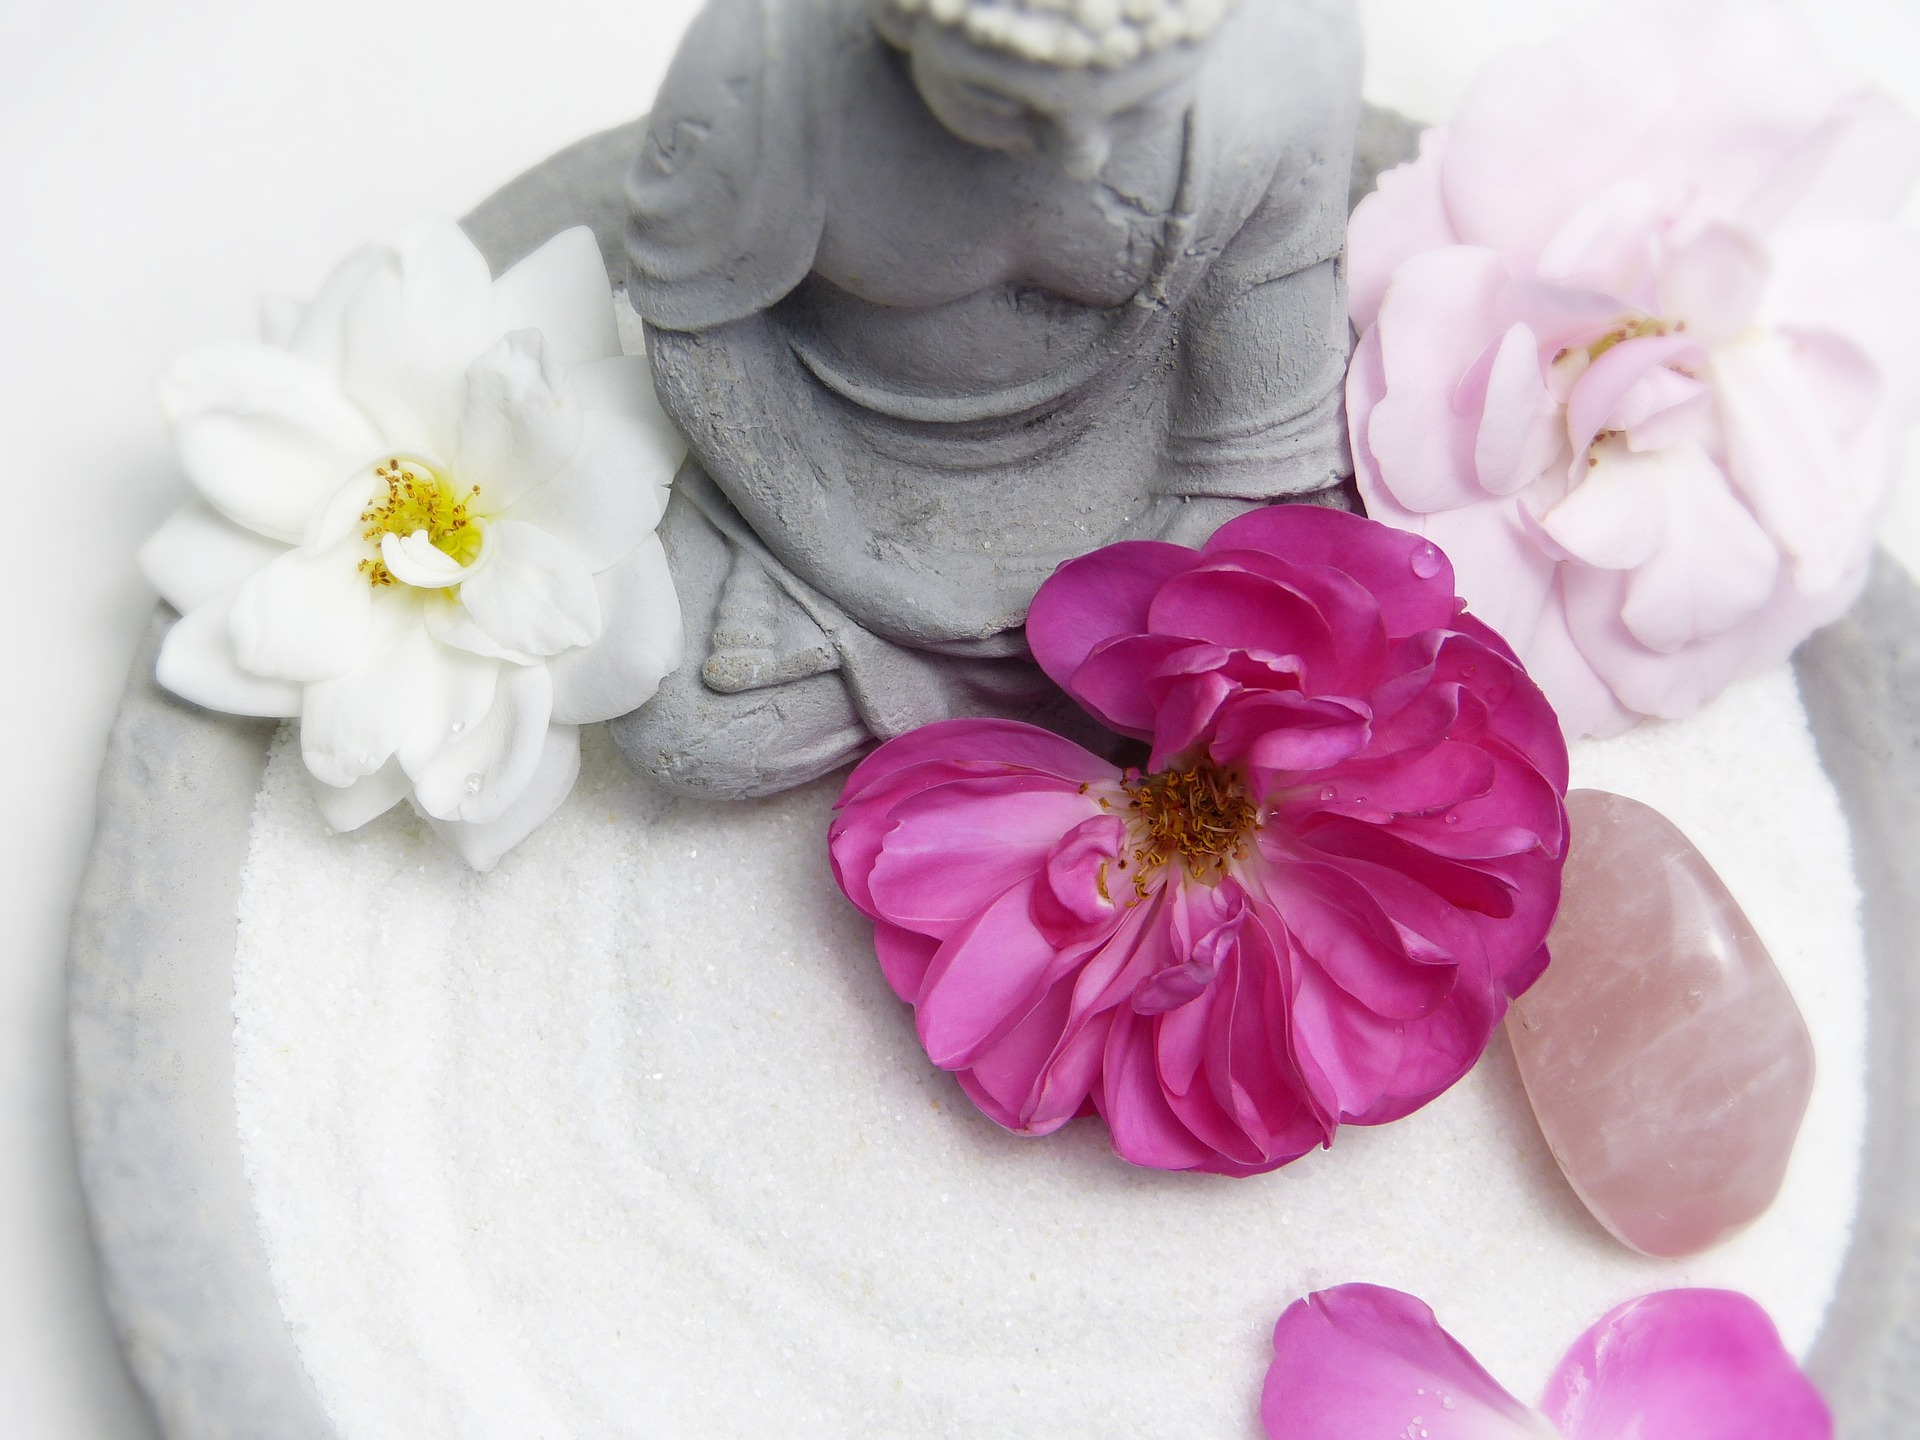 buddha-4456762_1920